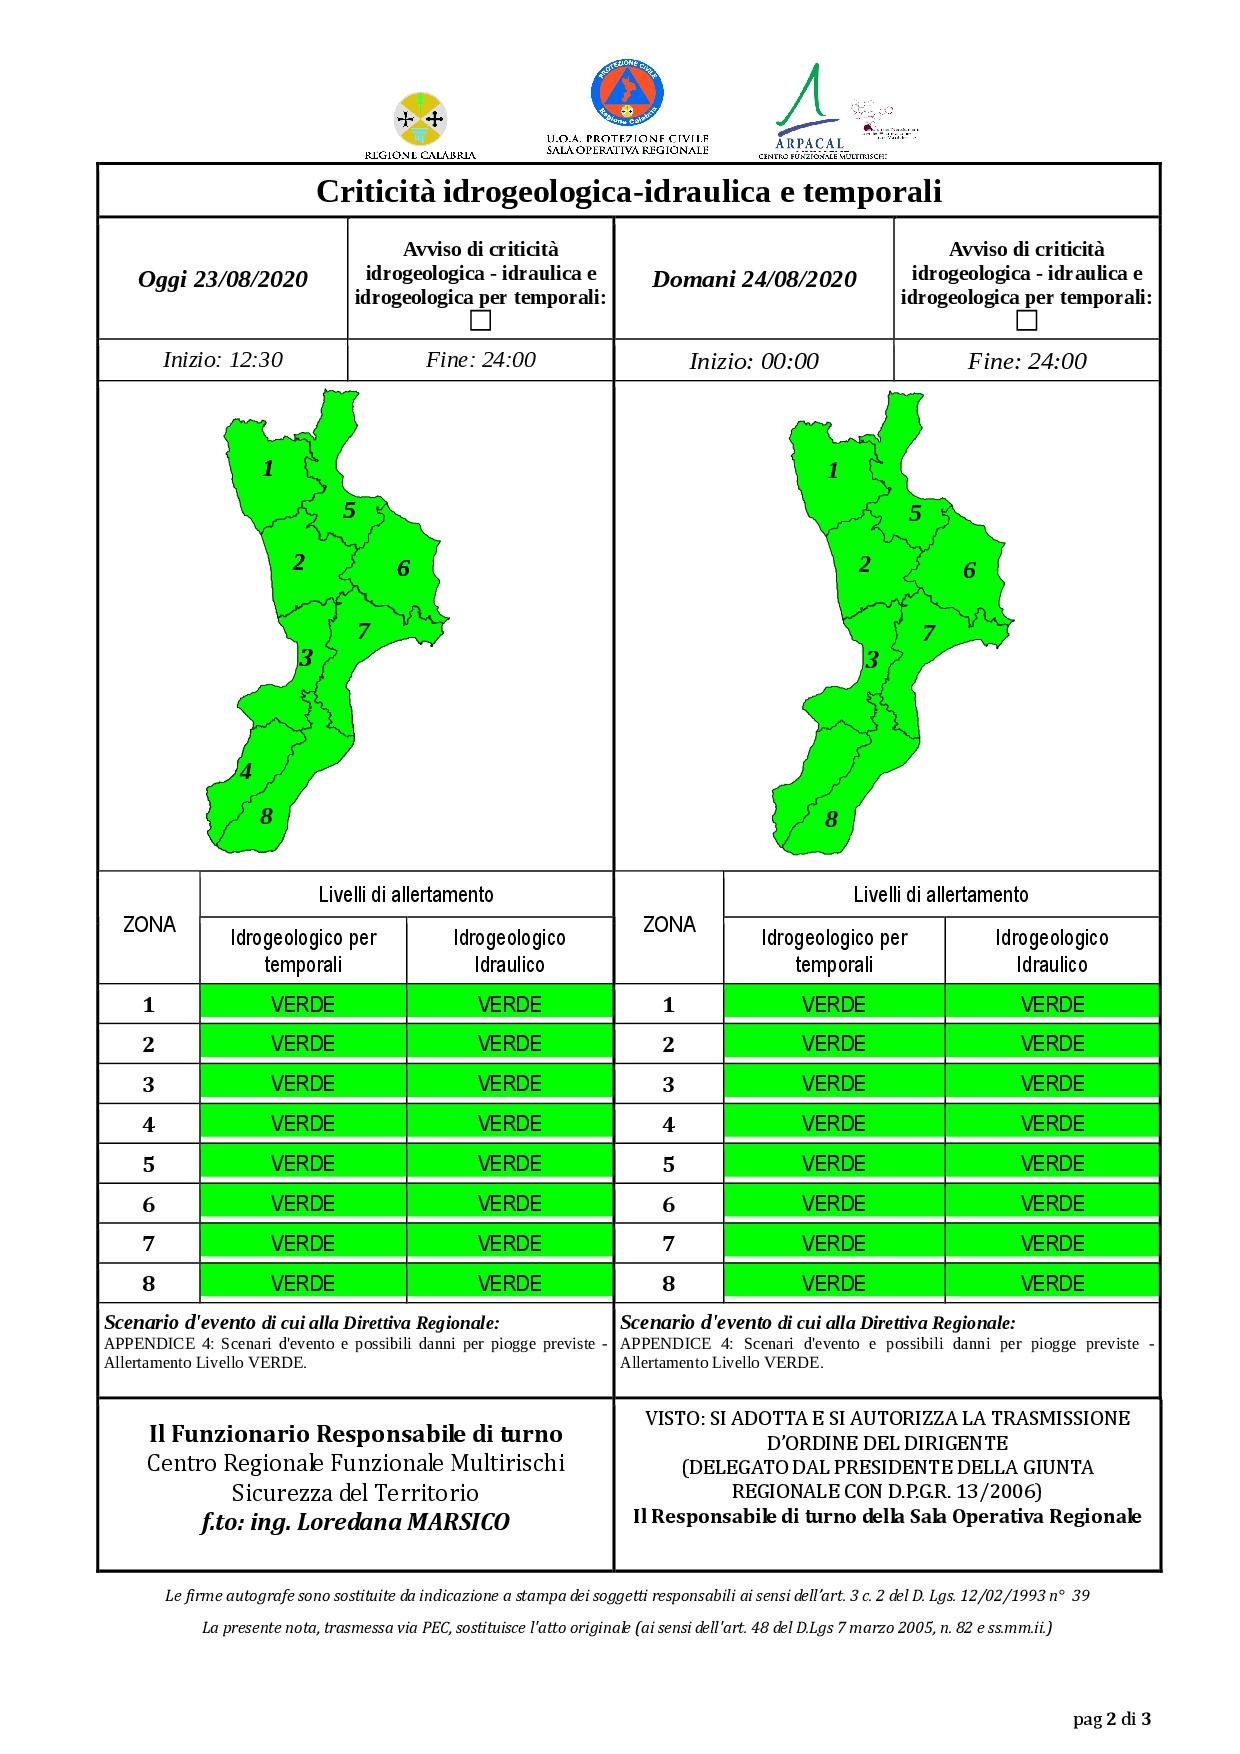 Criticità idrogeologica-idraulica e temporali in Calabria 23-08-2020